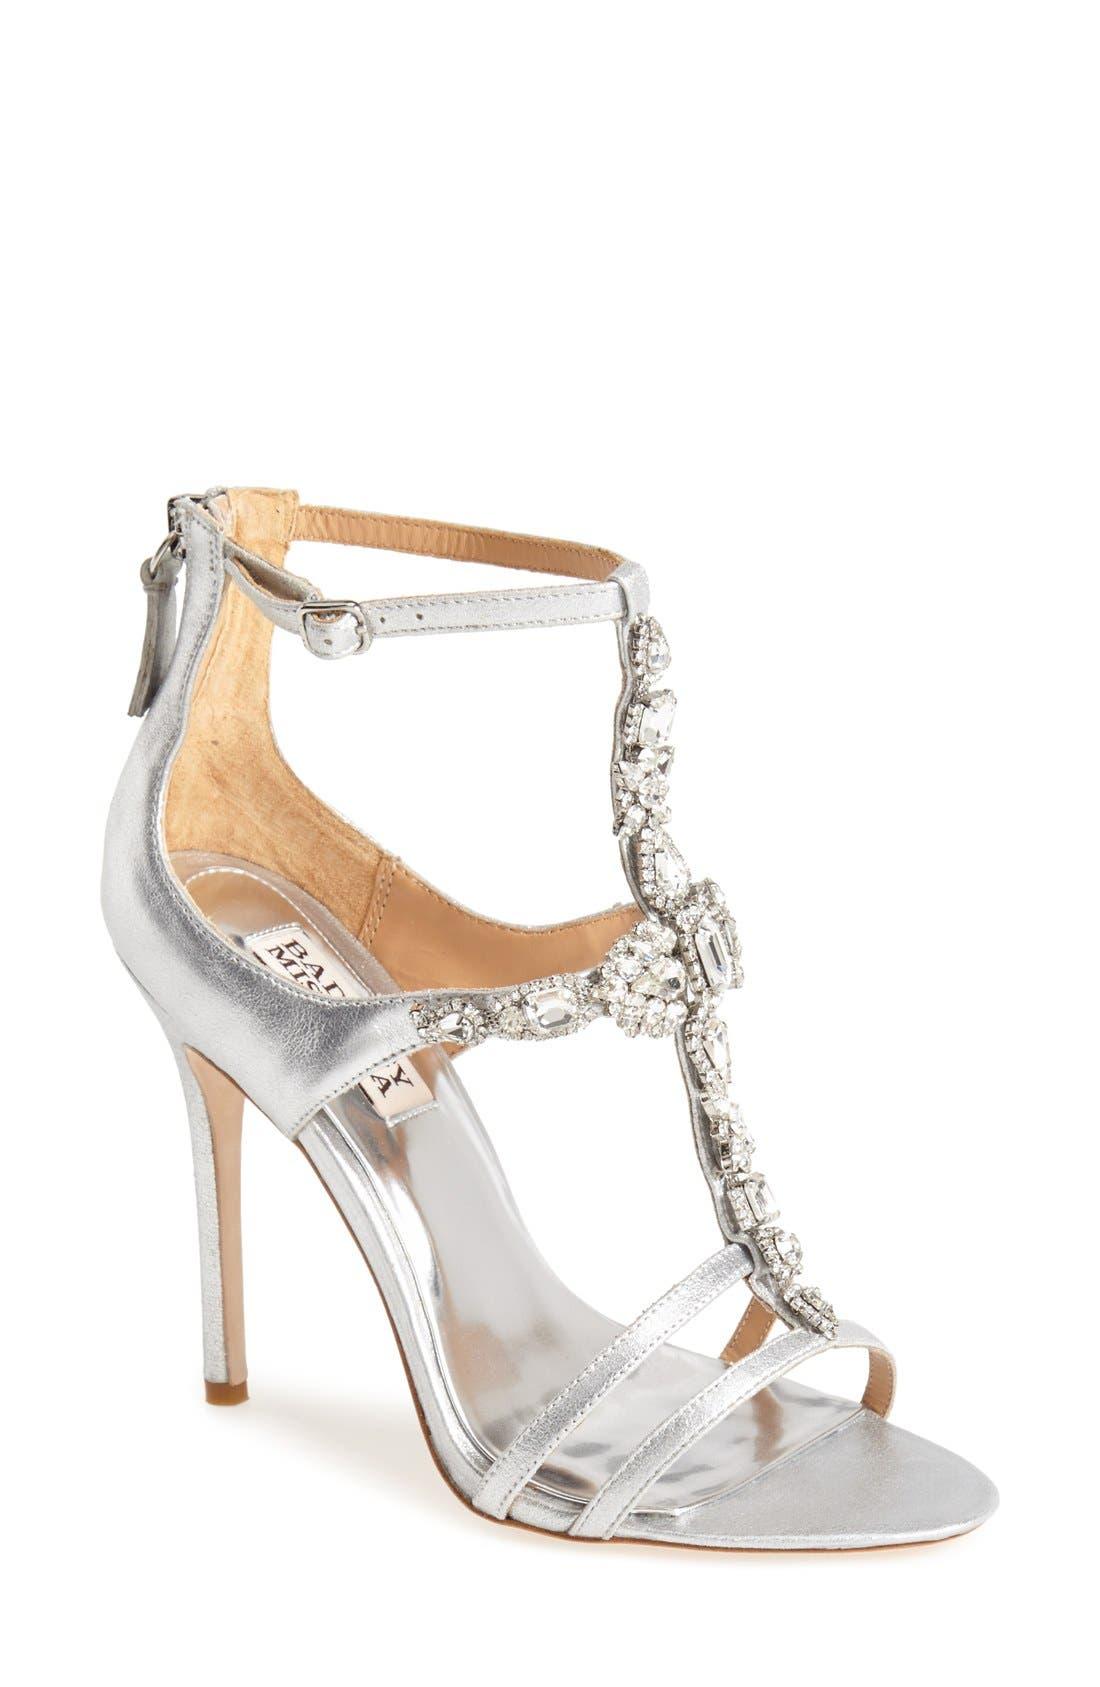 Alternate Image 1 Selected - Badgley Mischka 'Giovanna II' Satin Ankle Strap Sandal (Women)